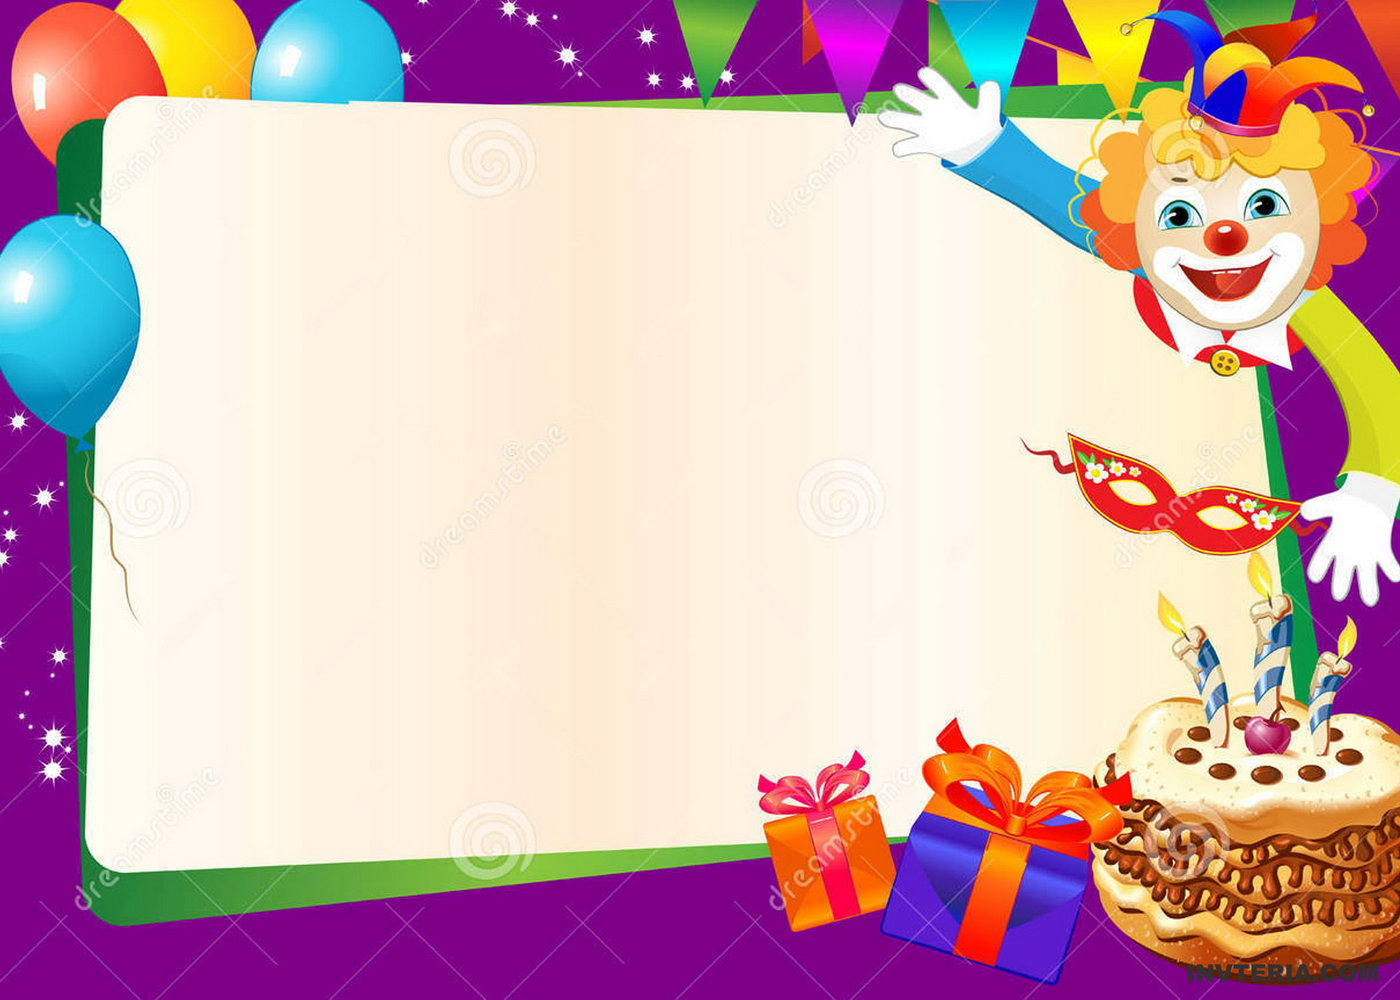 Editable Free Birthday Invitation Templates